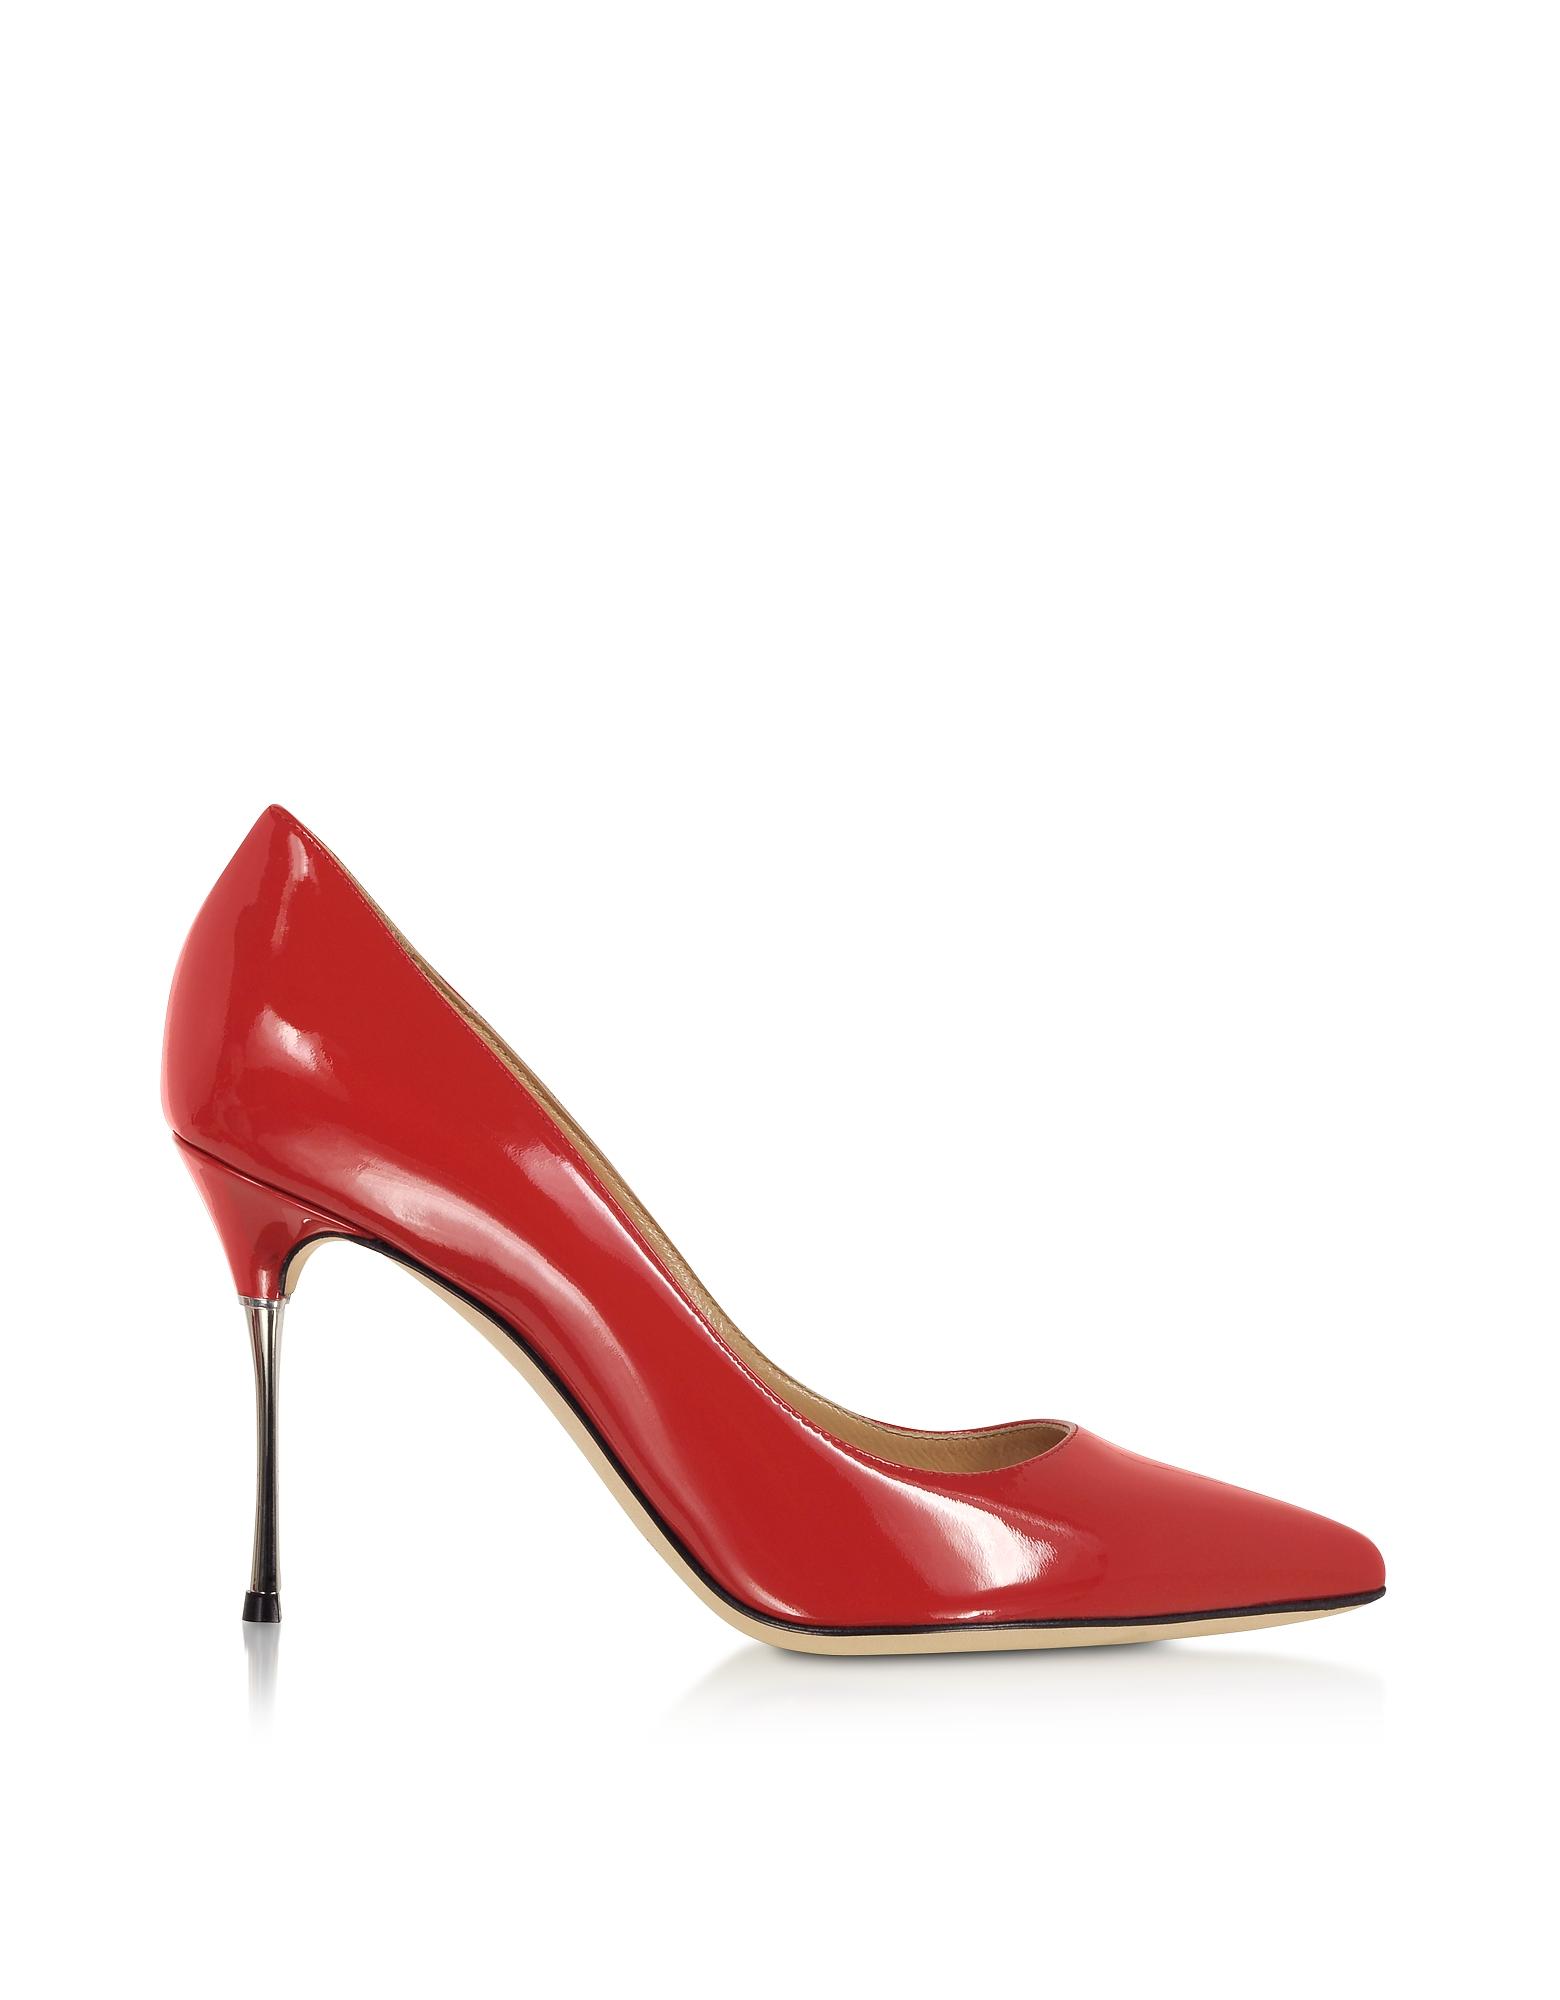 Carminio Red Soft Patent Leather Pumps